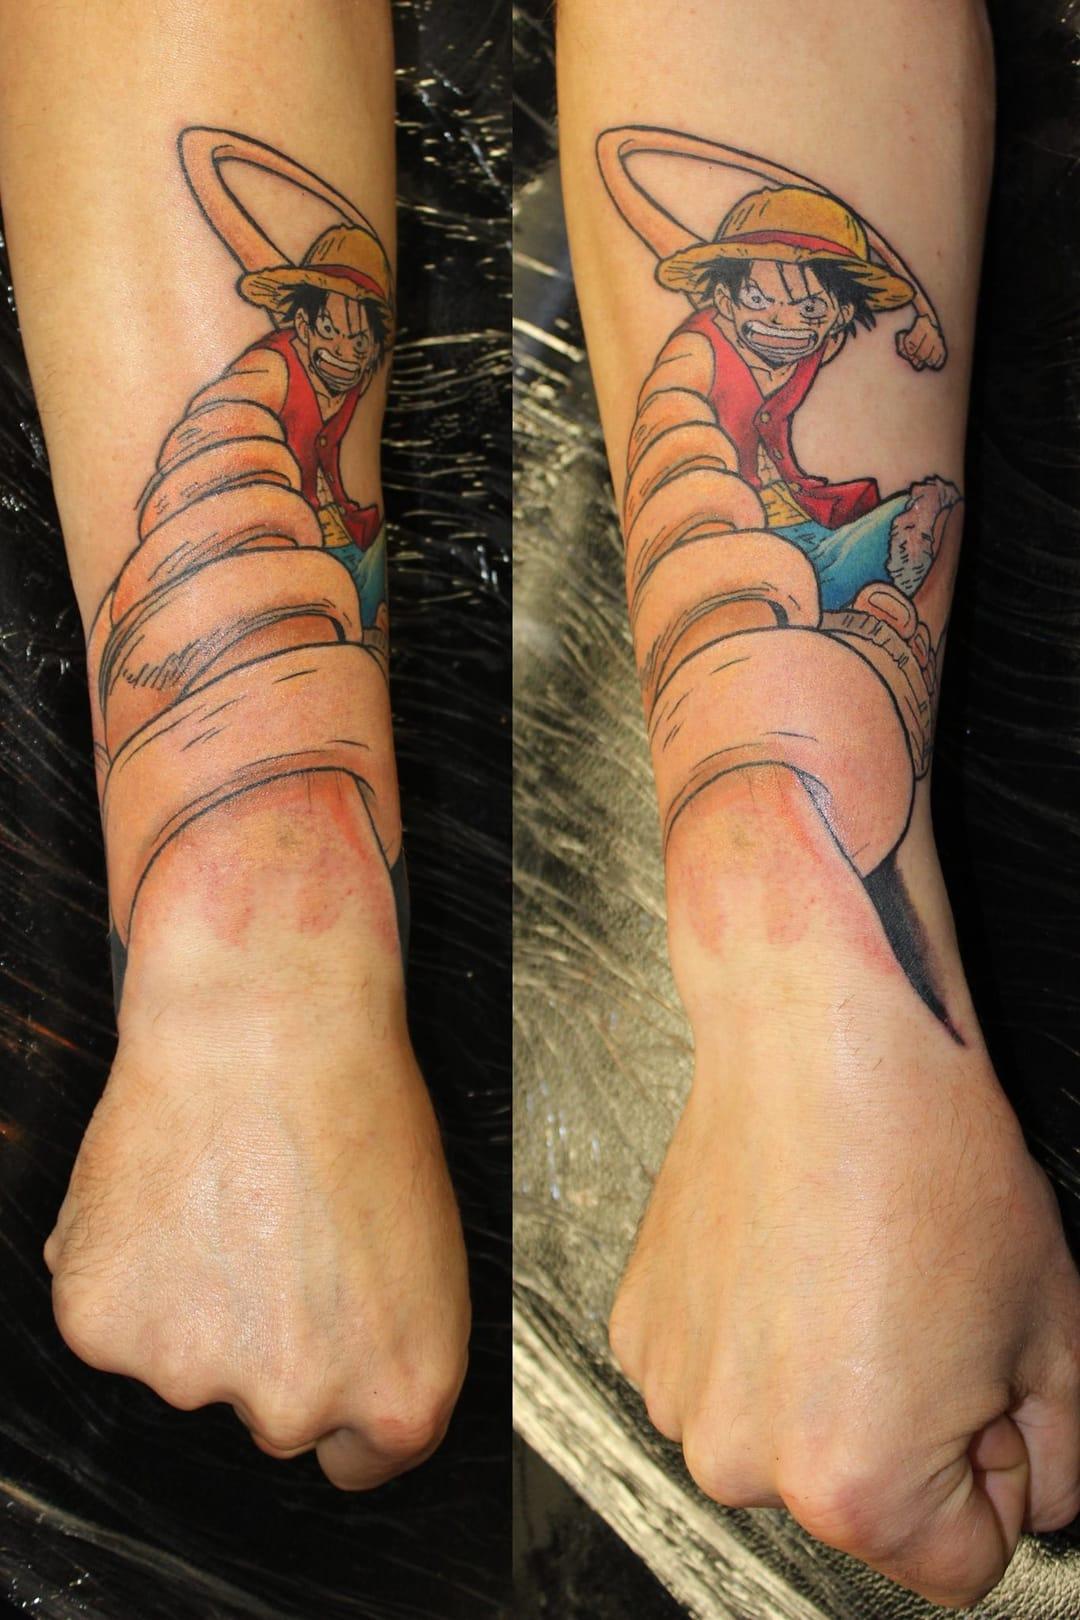 by Tattoo Tom